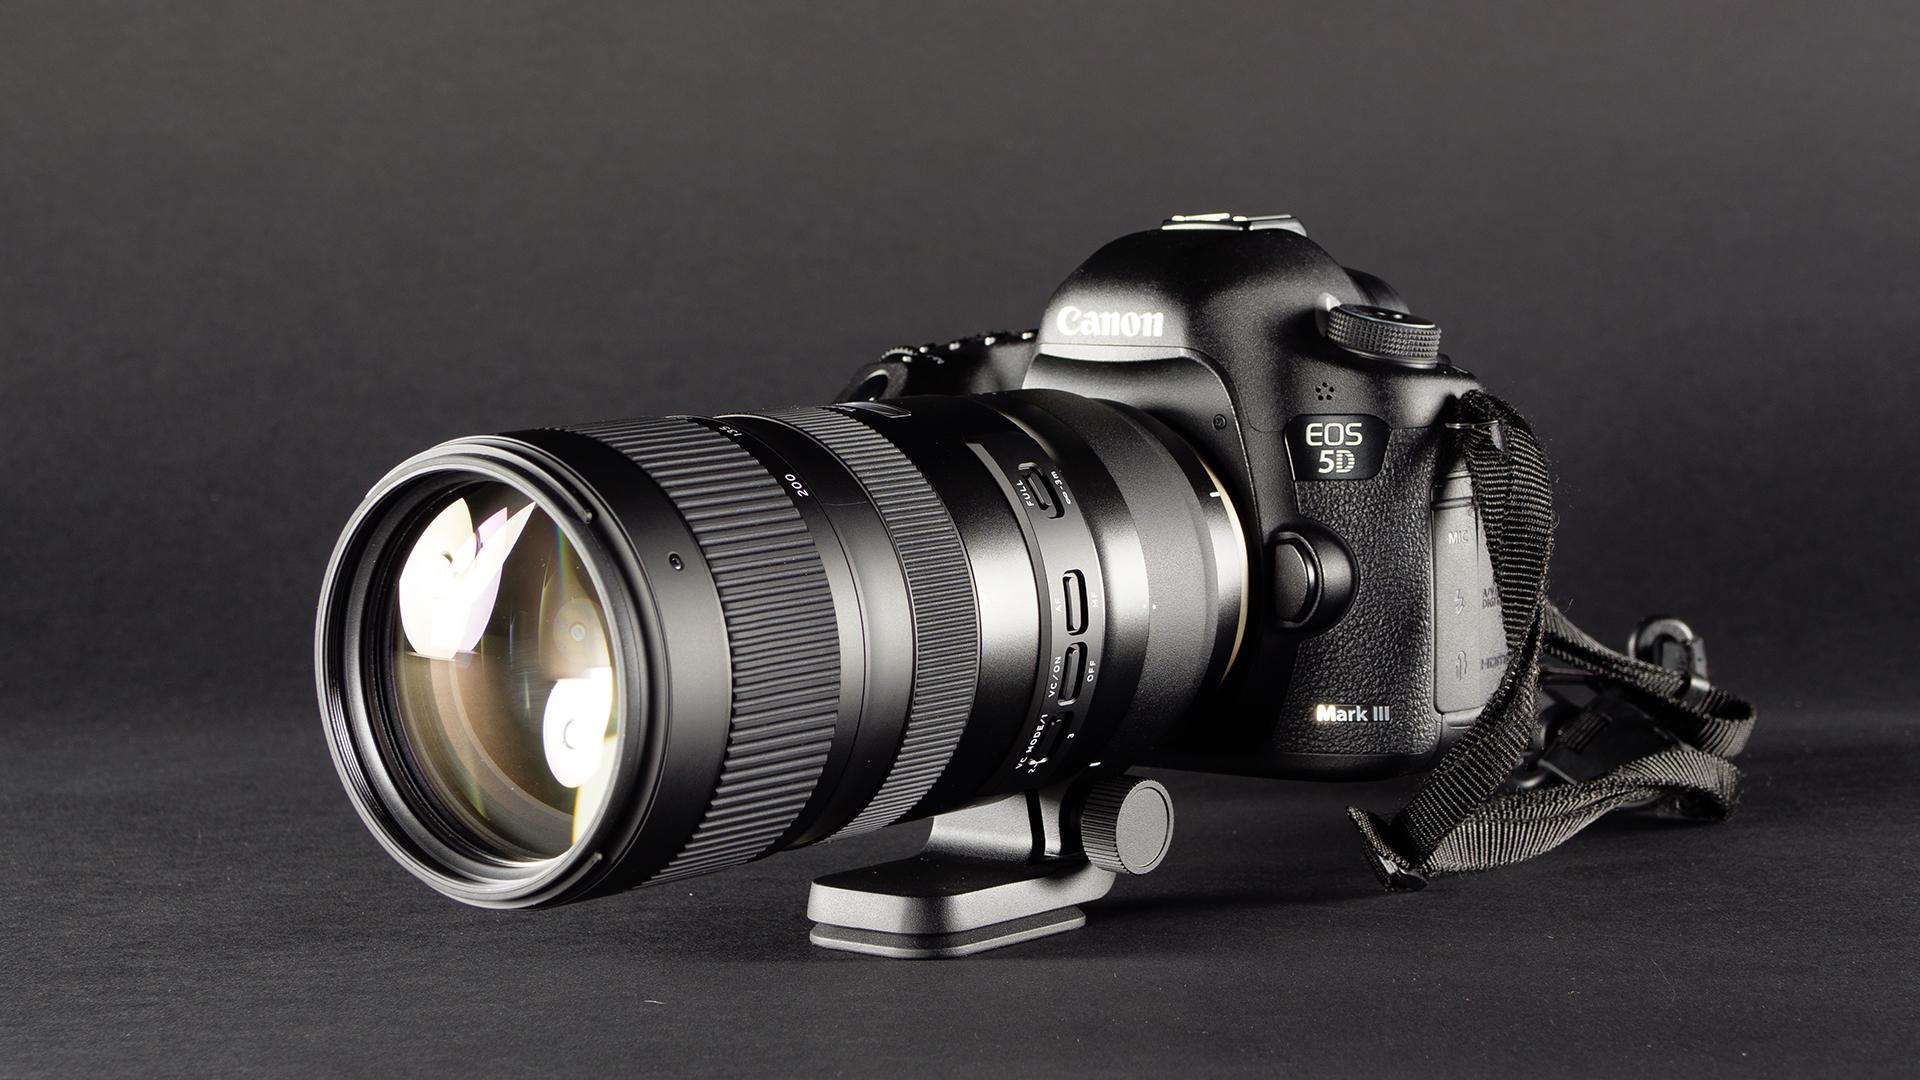 Karbist välja: Tamron SP 70-200mm f/2.8 Di VC USD G2 telesuumobjektiiv